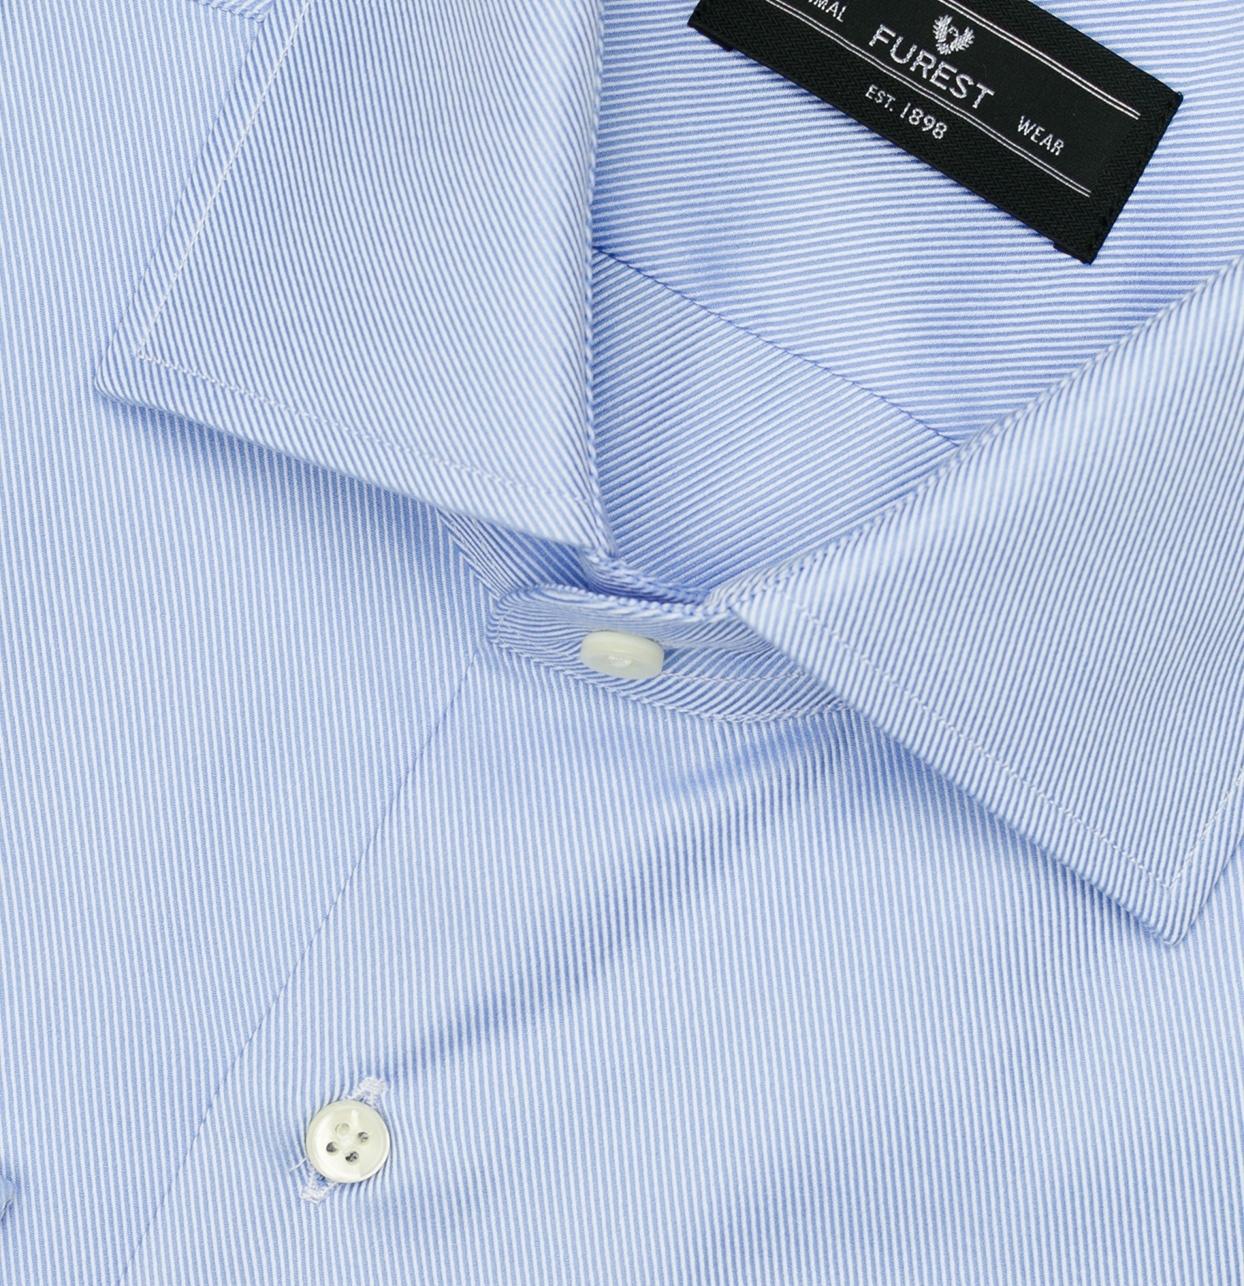 Camisa Formal Wear REGULAR FIT cuello Italiano, modelo NAPOLI tejido twill color azul, 100% Algodón. - Ítem1